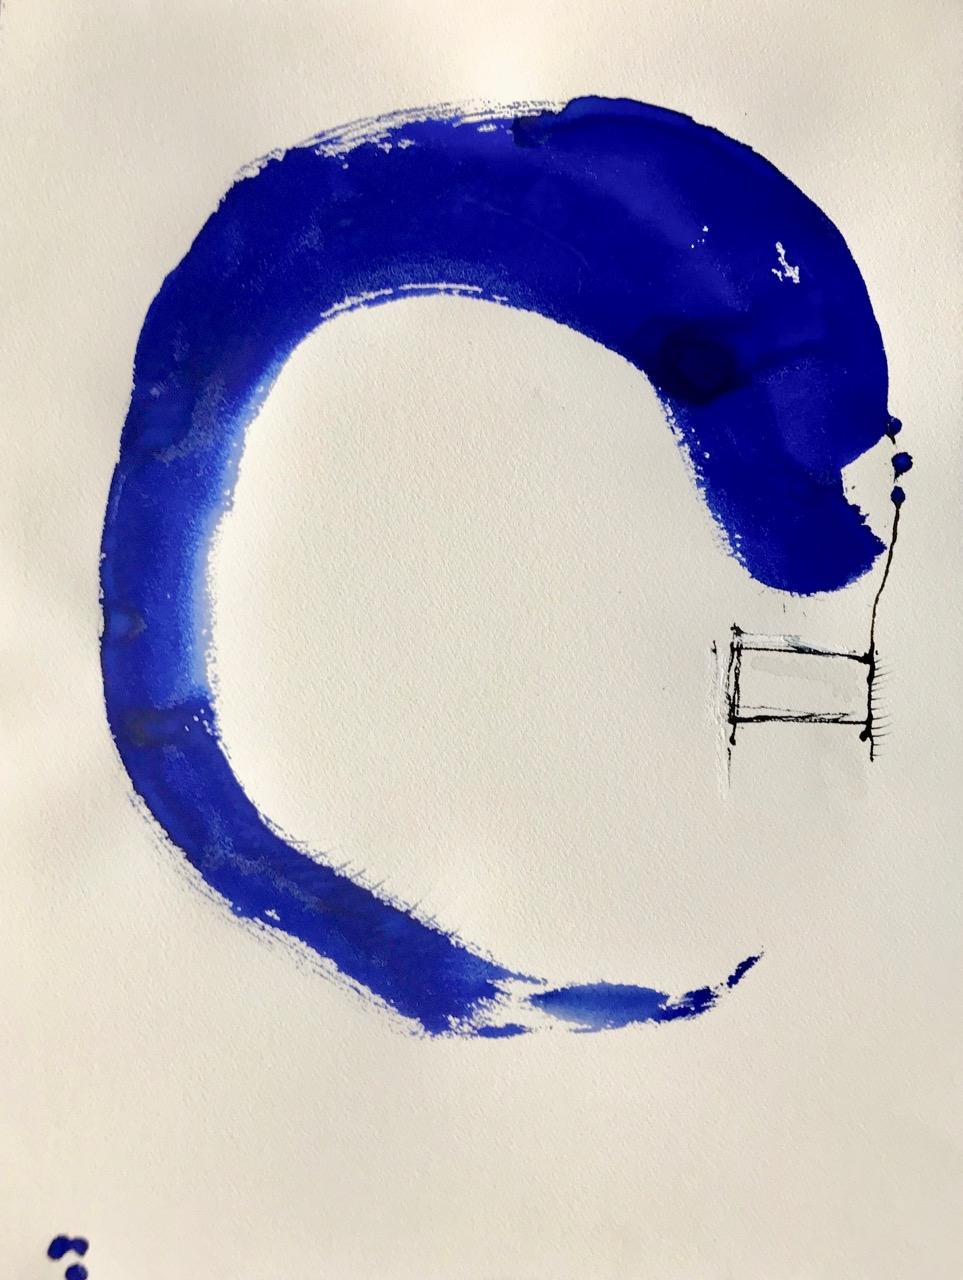 Bondi-Blue-Bananana, Pt.2, Aquarell und Tusche auf Papier, 46 x 61 cm, 2018